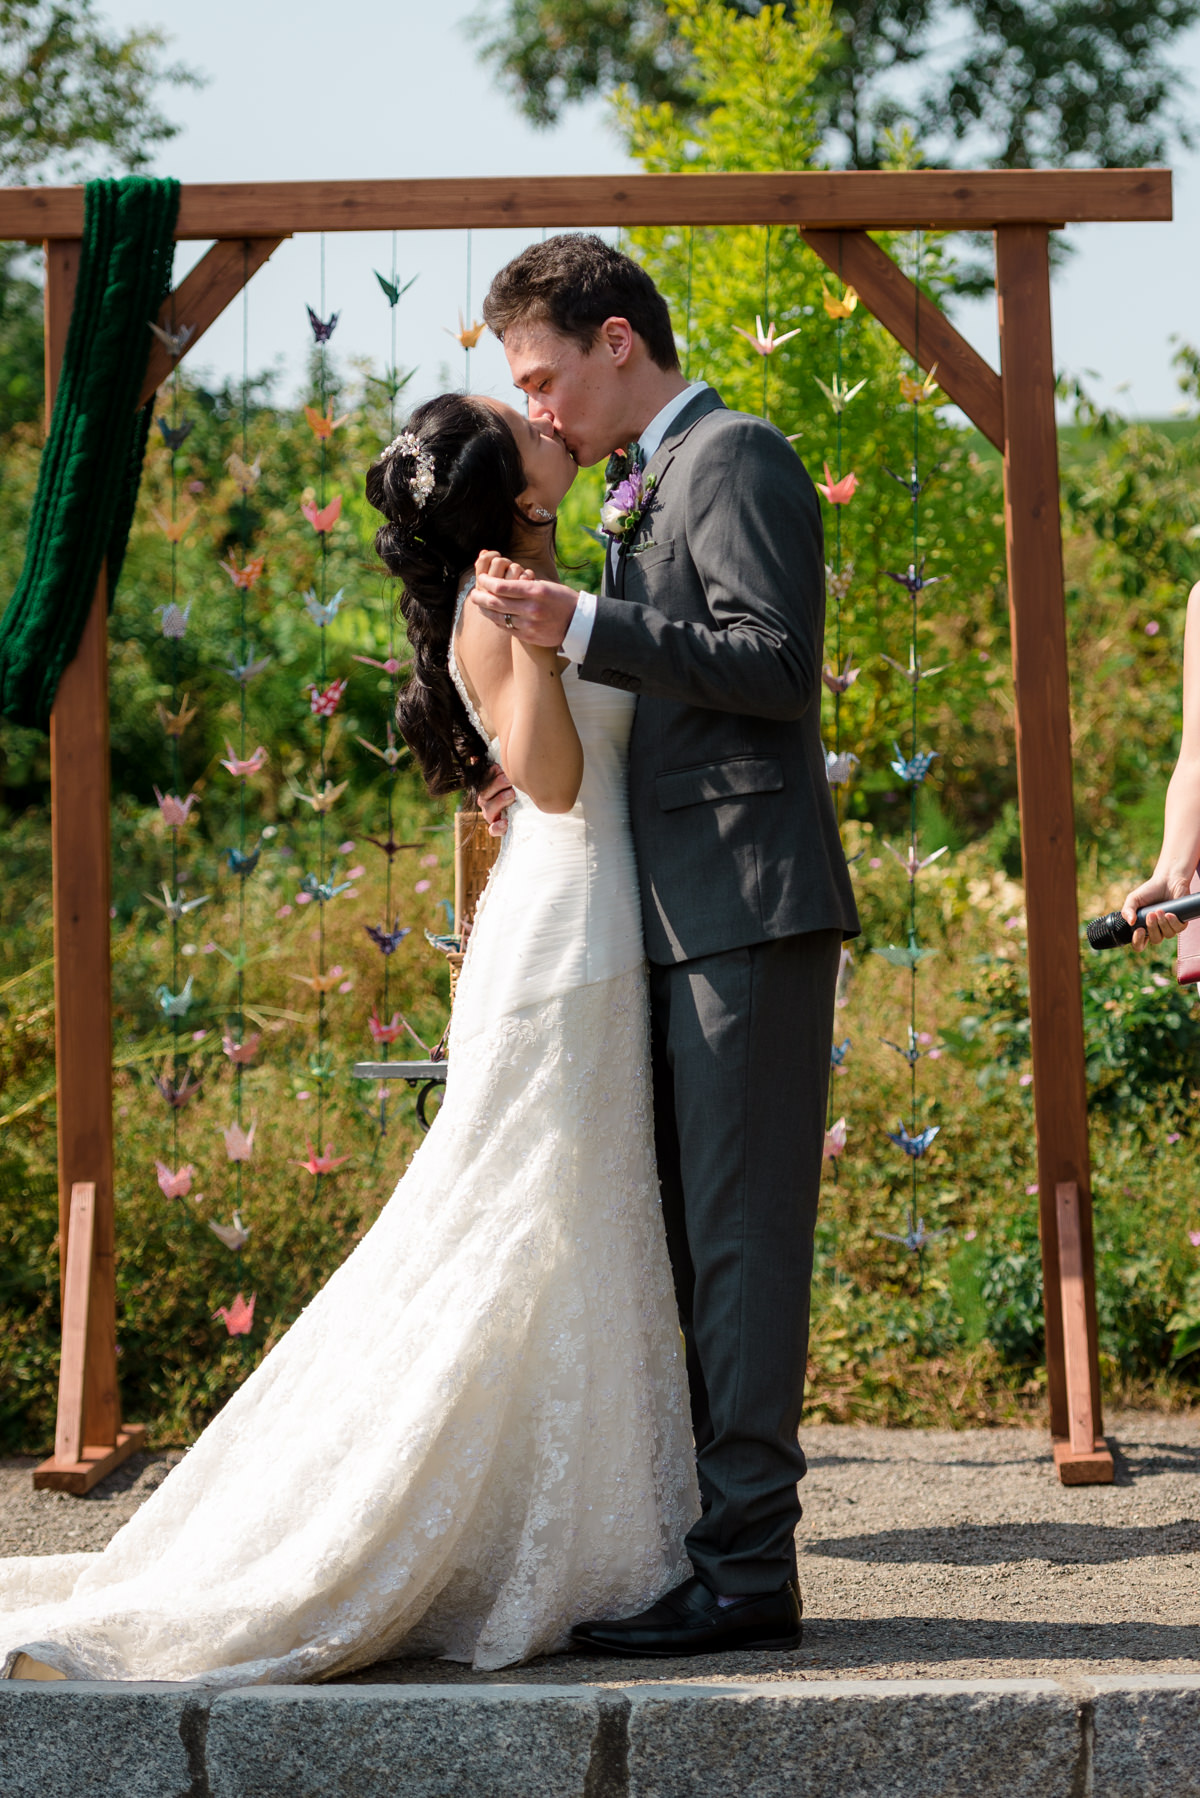 Andrew Tat - Documentary Wedding Photography - Heritage Hall - Kirkland, Washington - Grace & James - 52.JPG